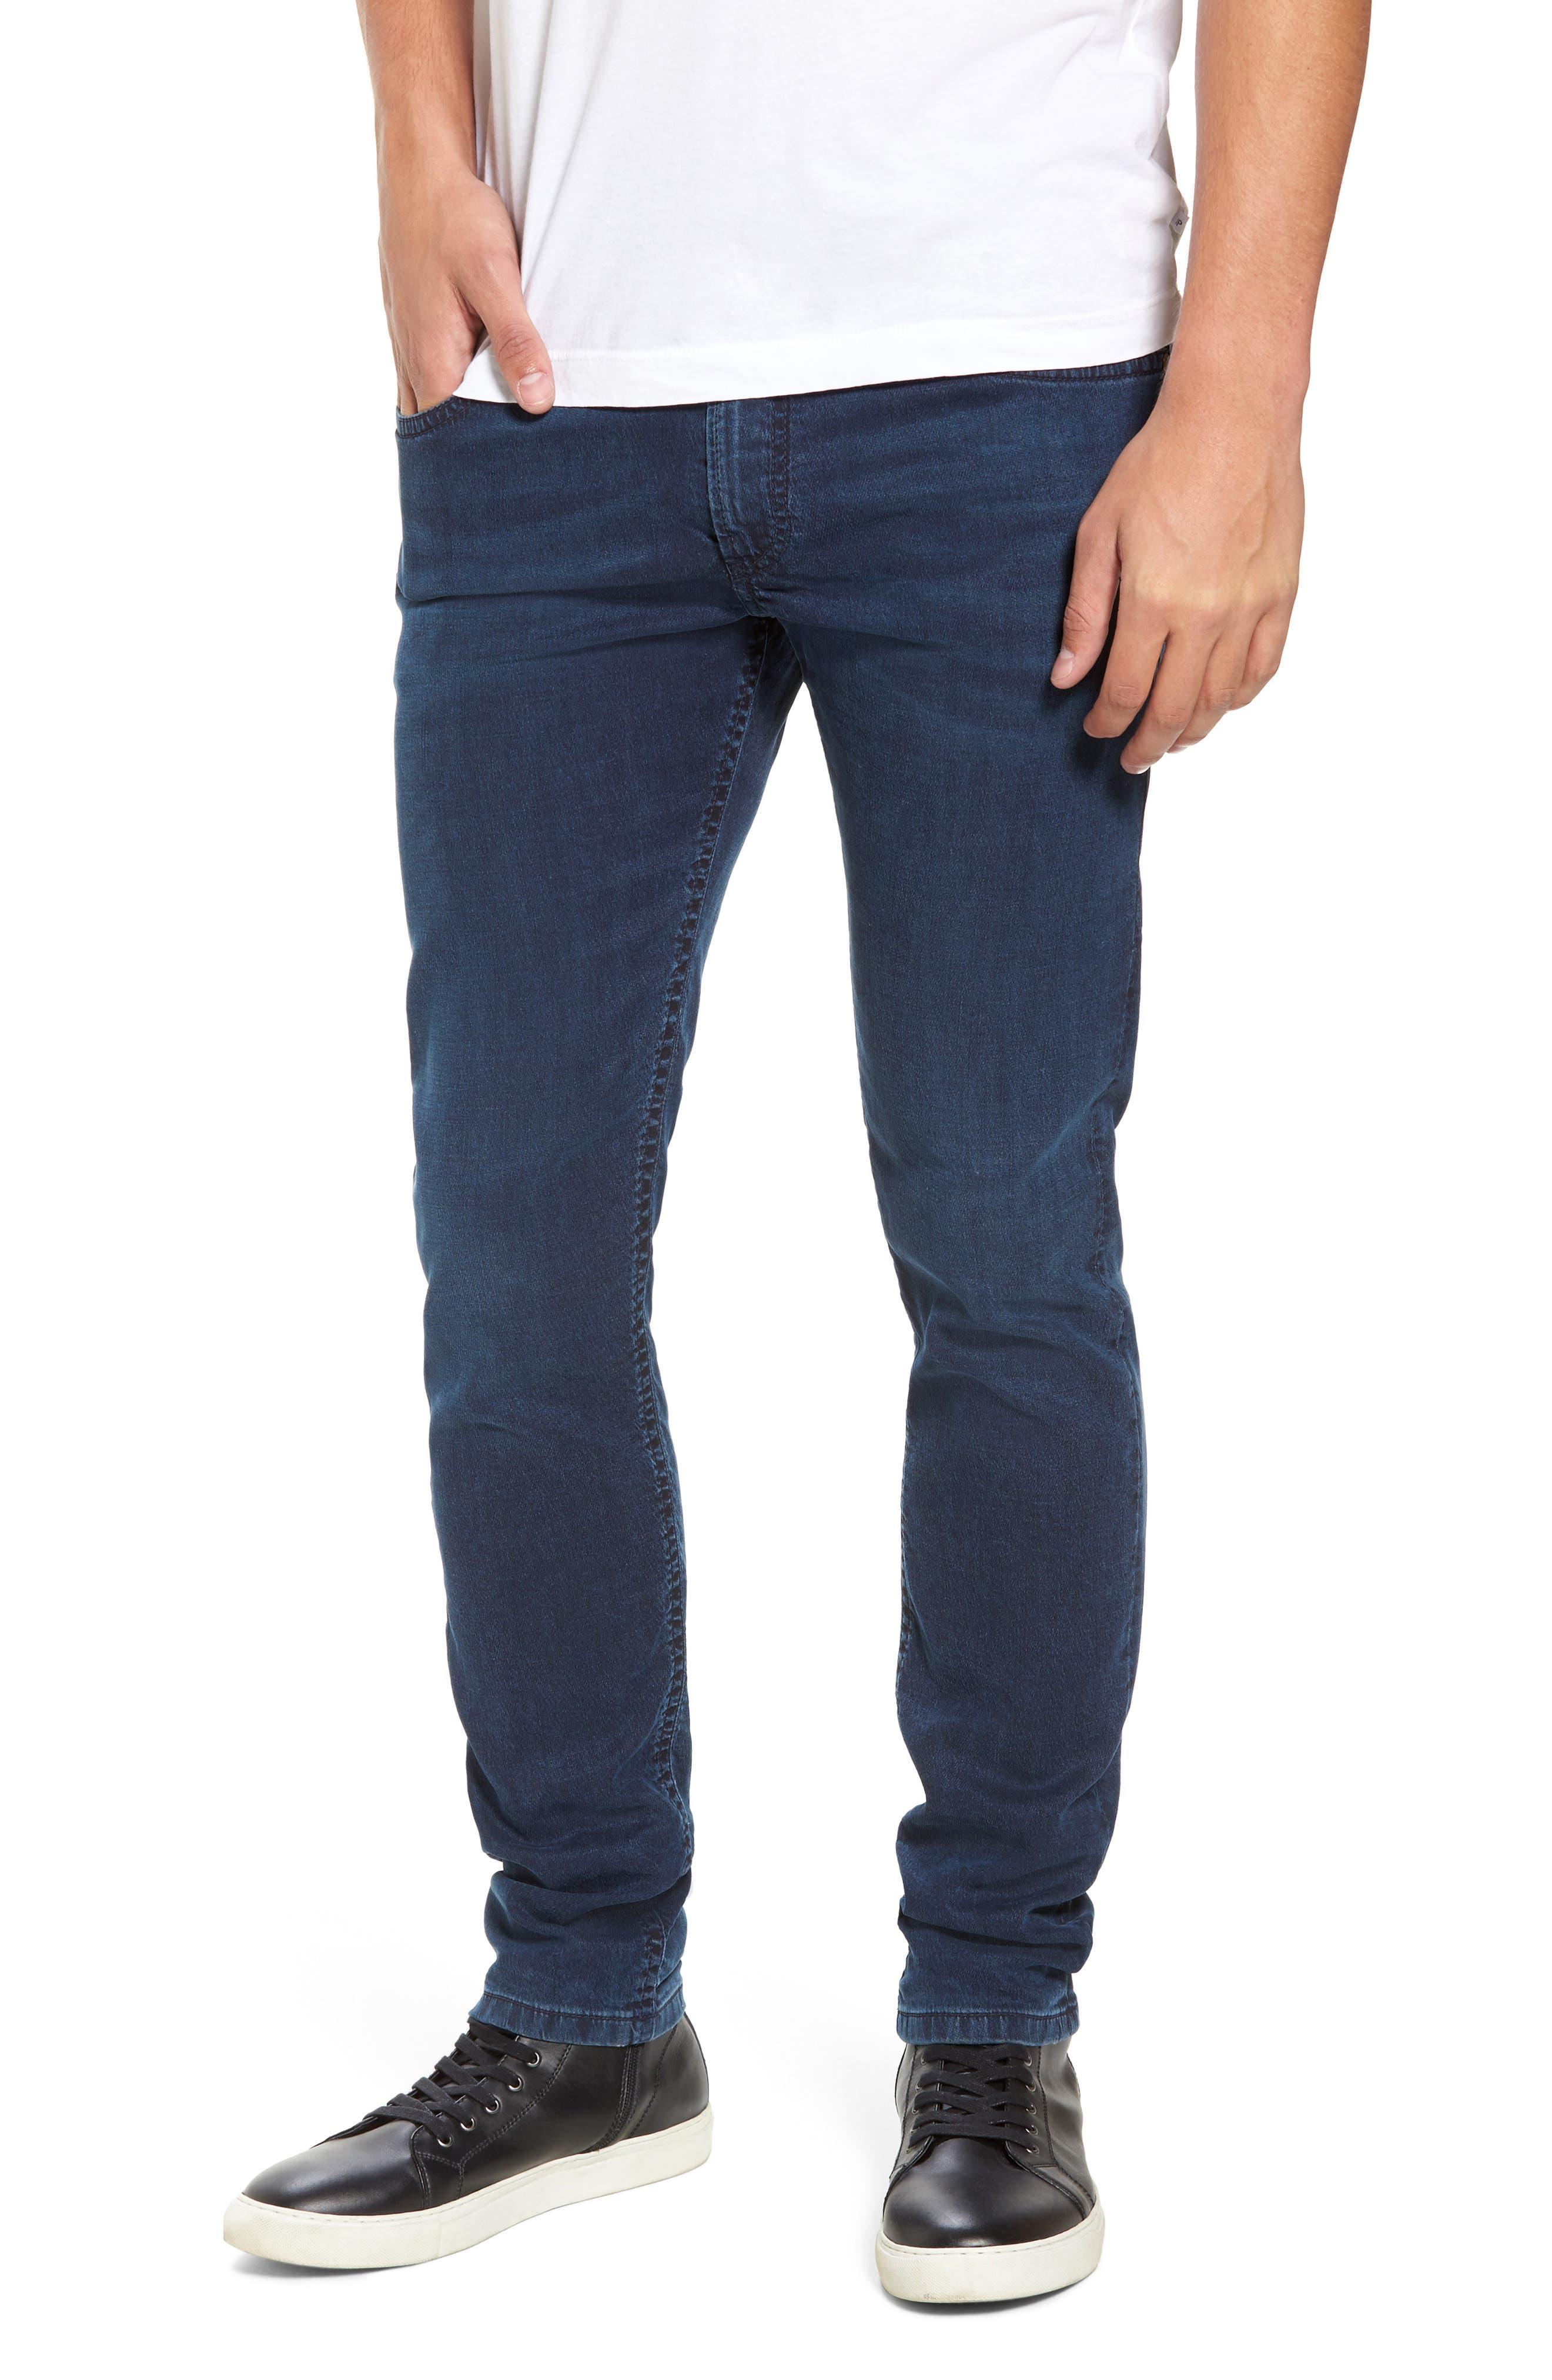 Thommer Slim Fit Jeans,                             Main thumbnail 1, color,                             0688J